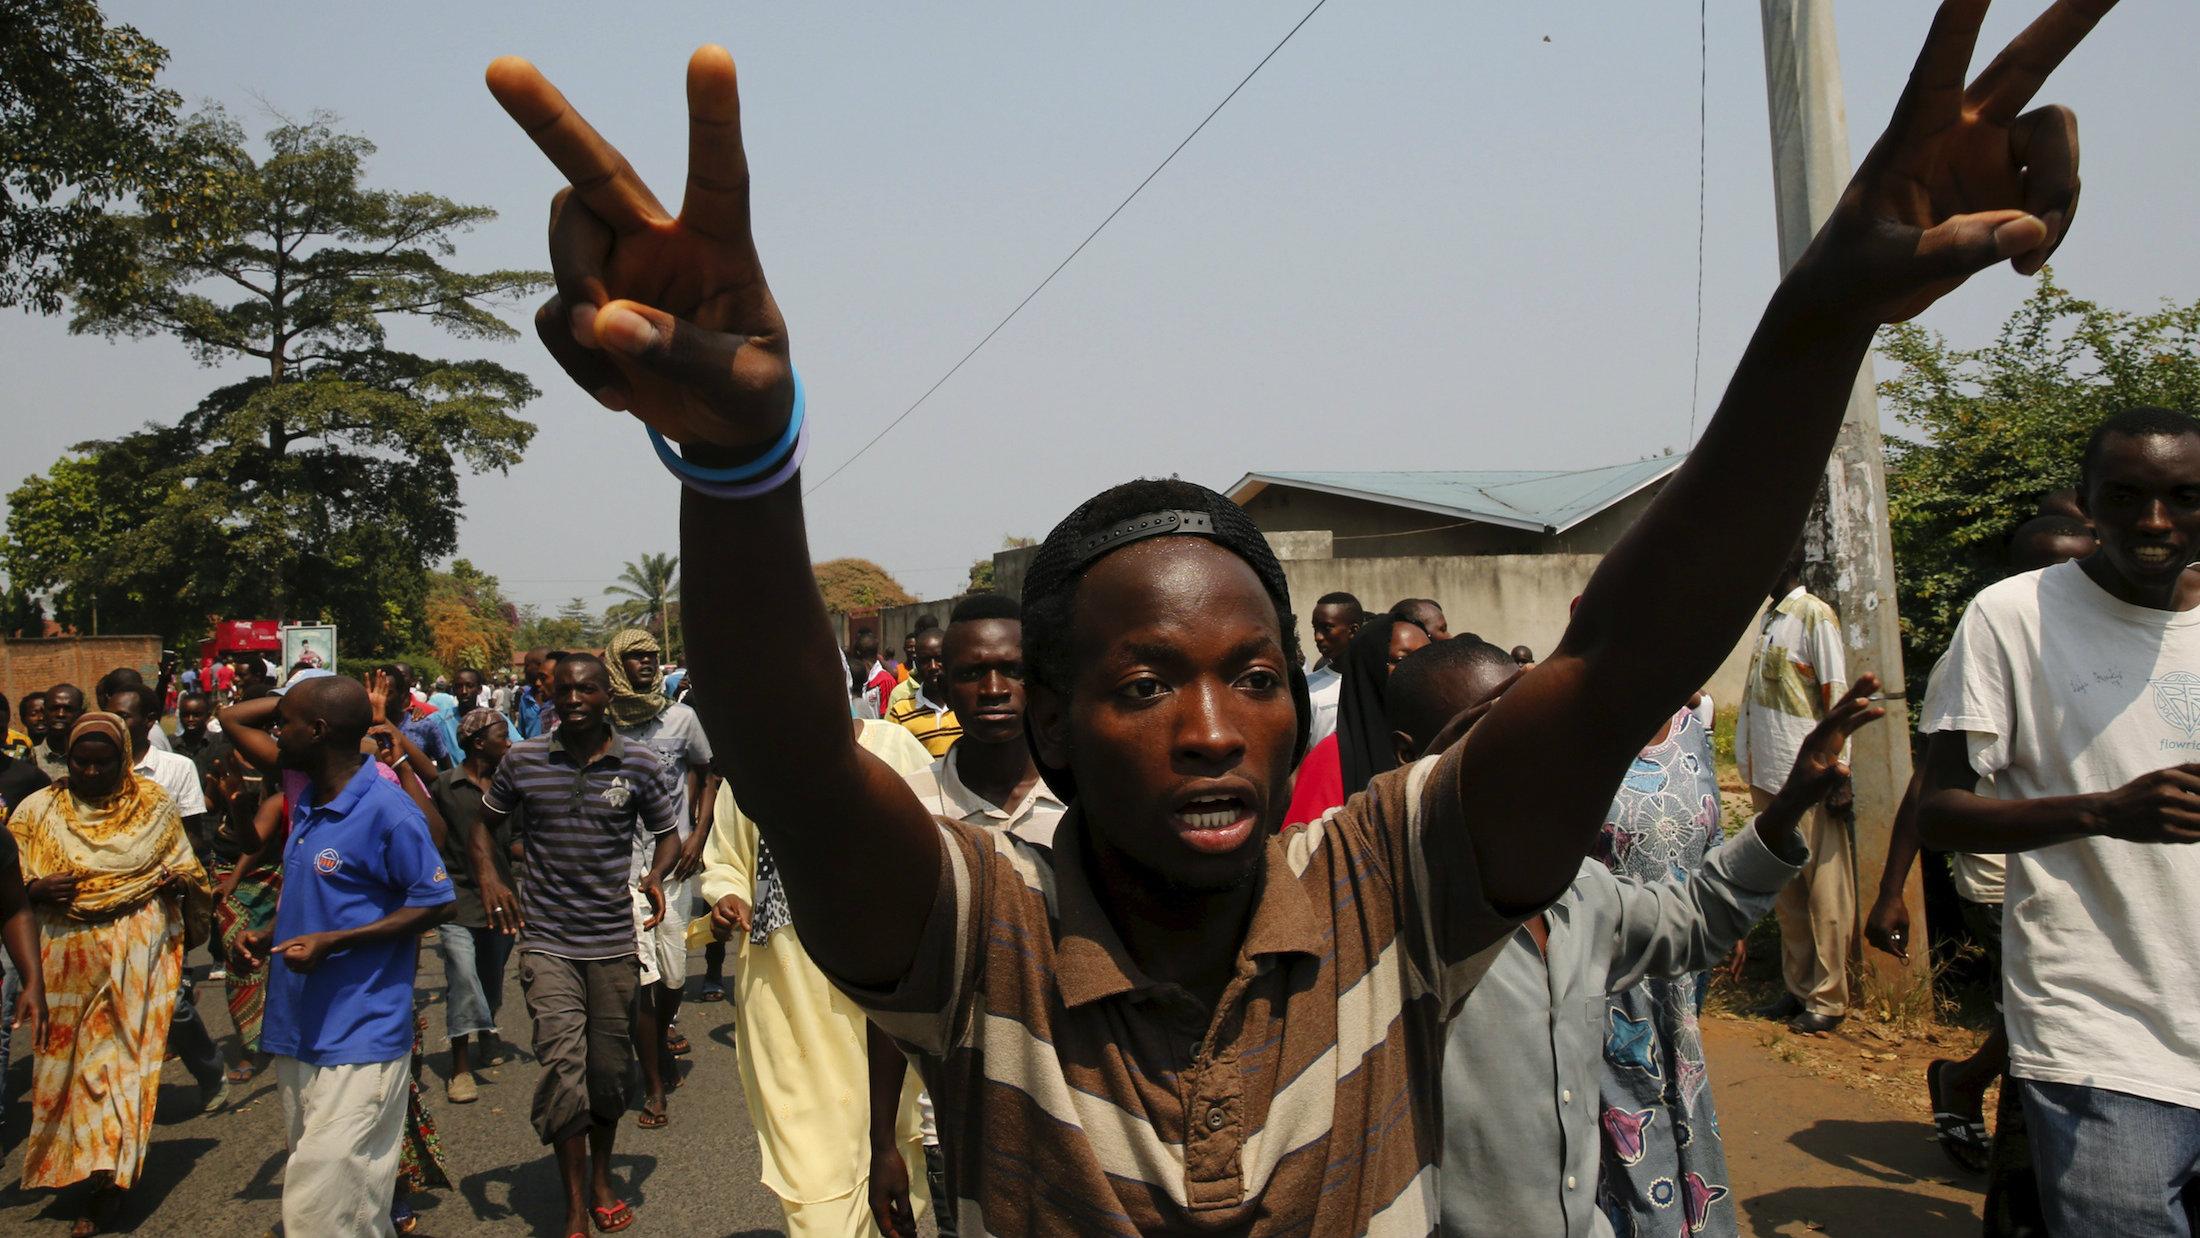 Protestors in Bujumbura's Niyakabiga district on election day in July.